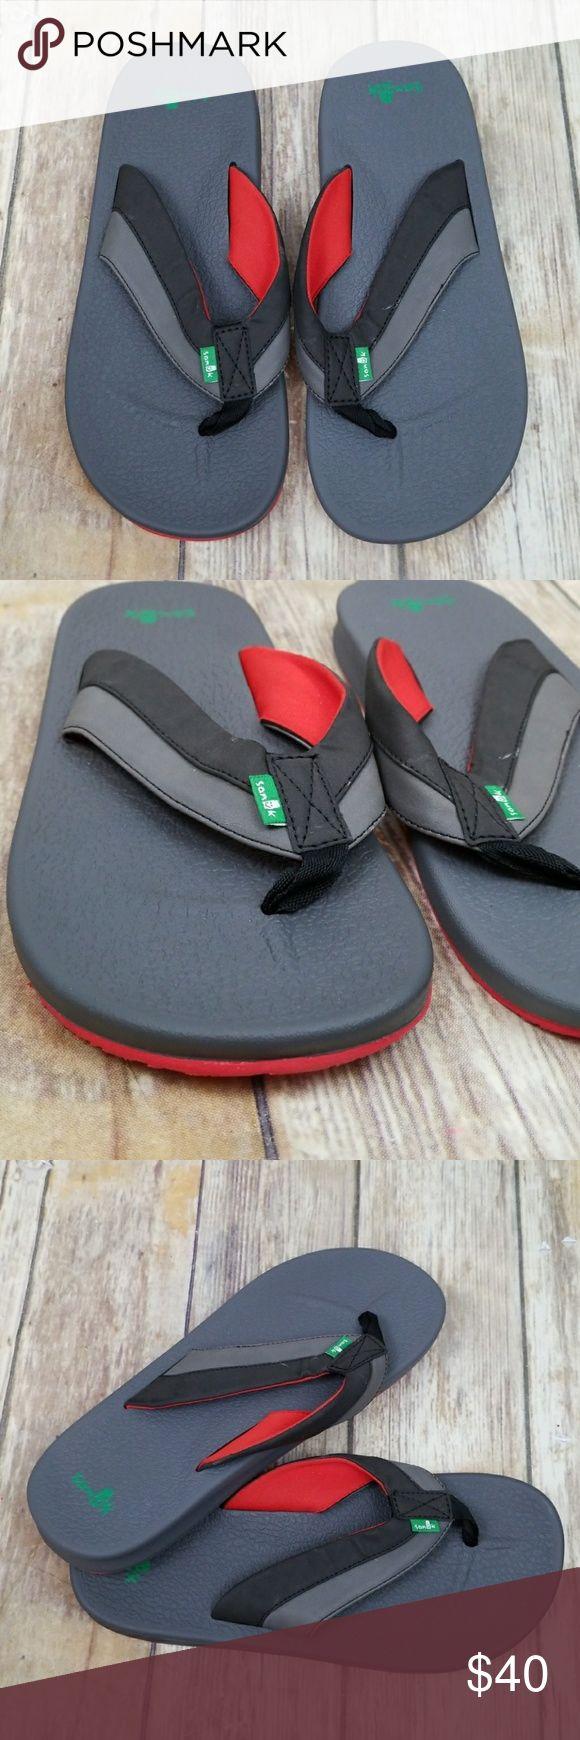 Sanuk flip flops Brand new flip flops Style name  brumeister  Color  black charcoal red Men's size 9 Sanuk Shoes Sandals & Flip-Flops